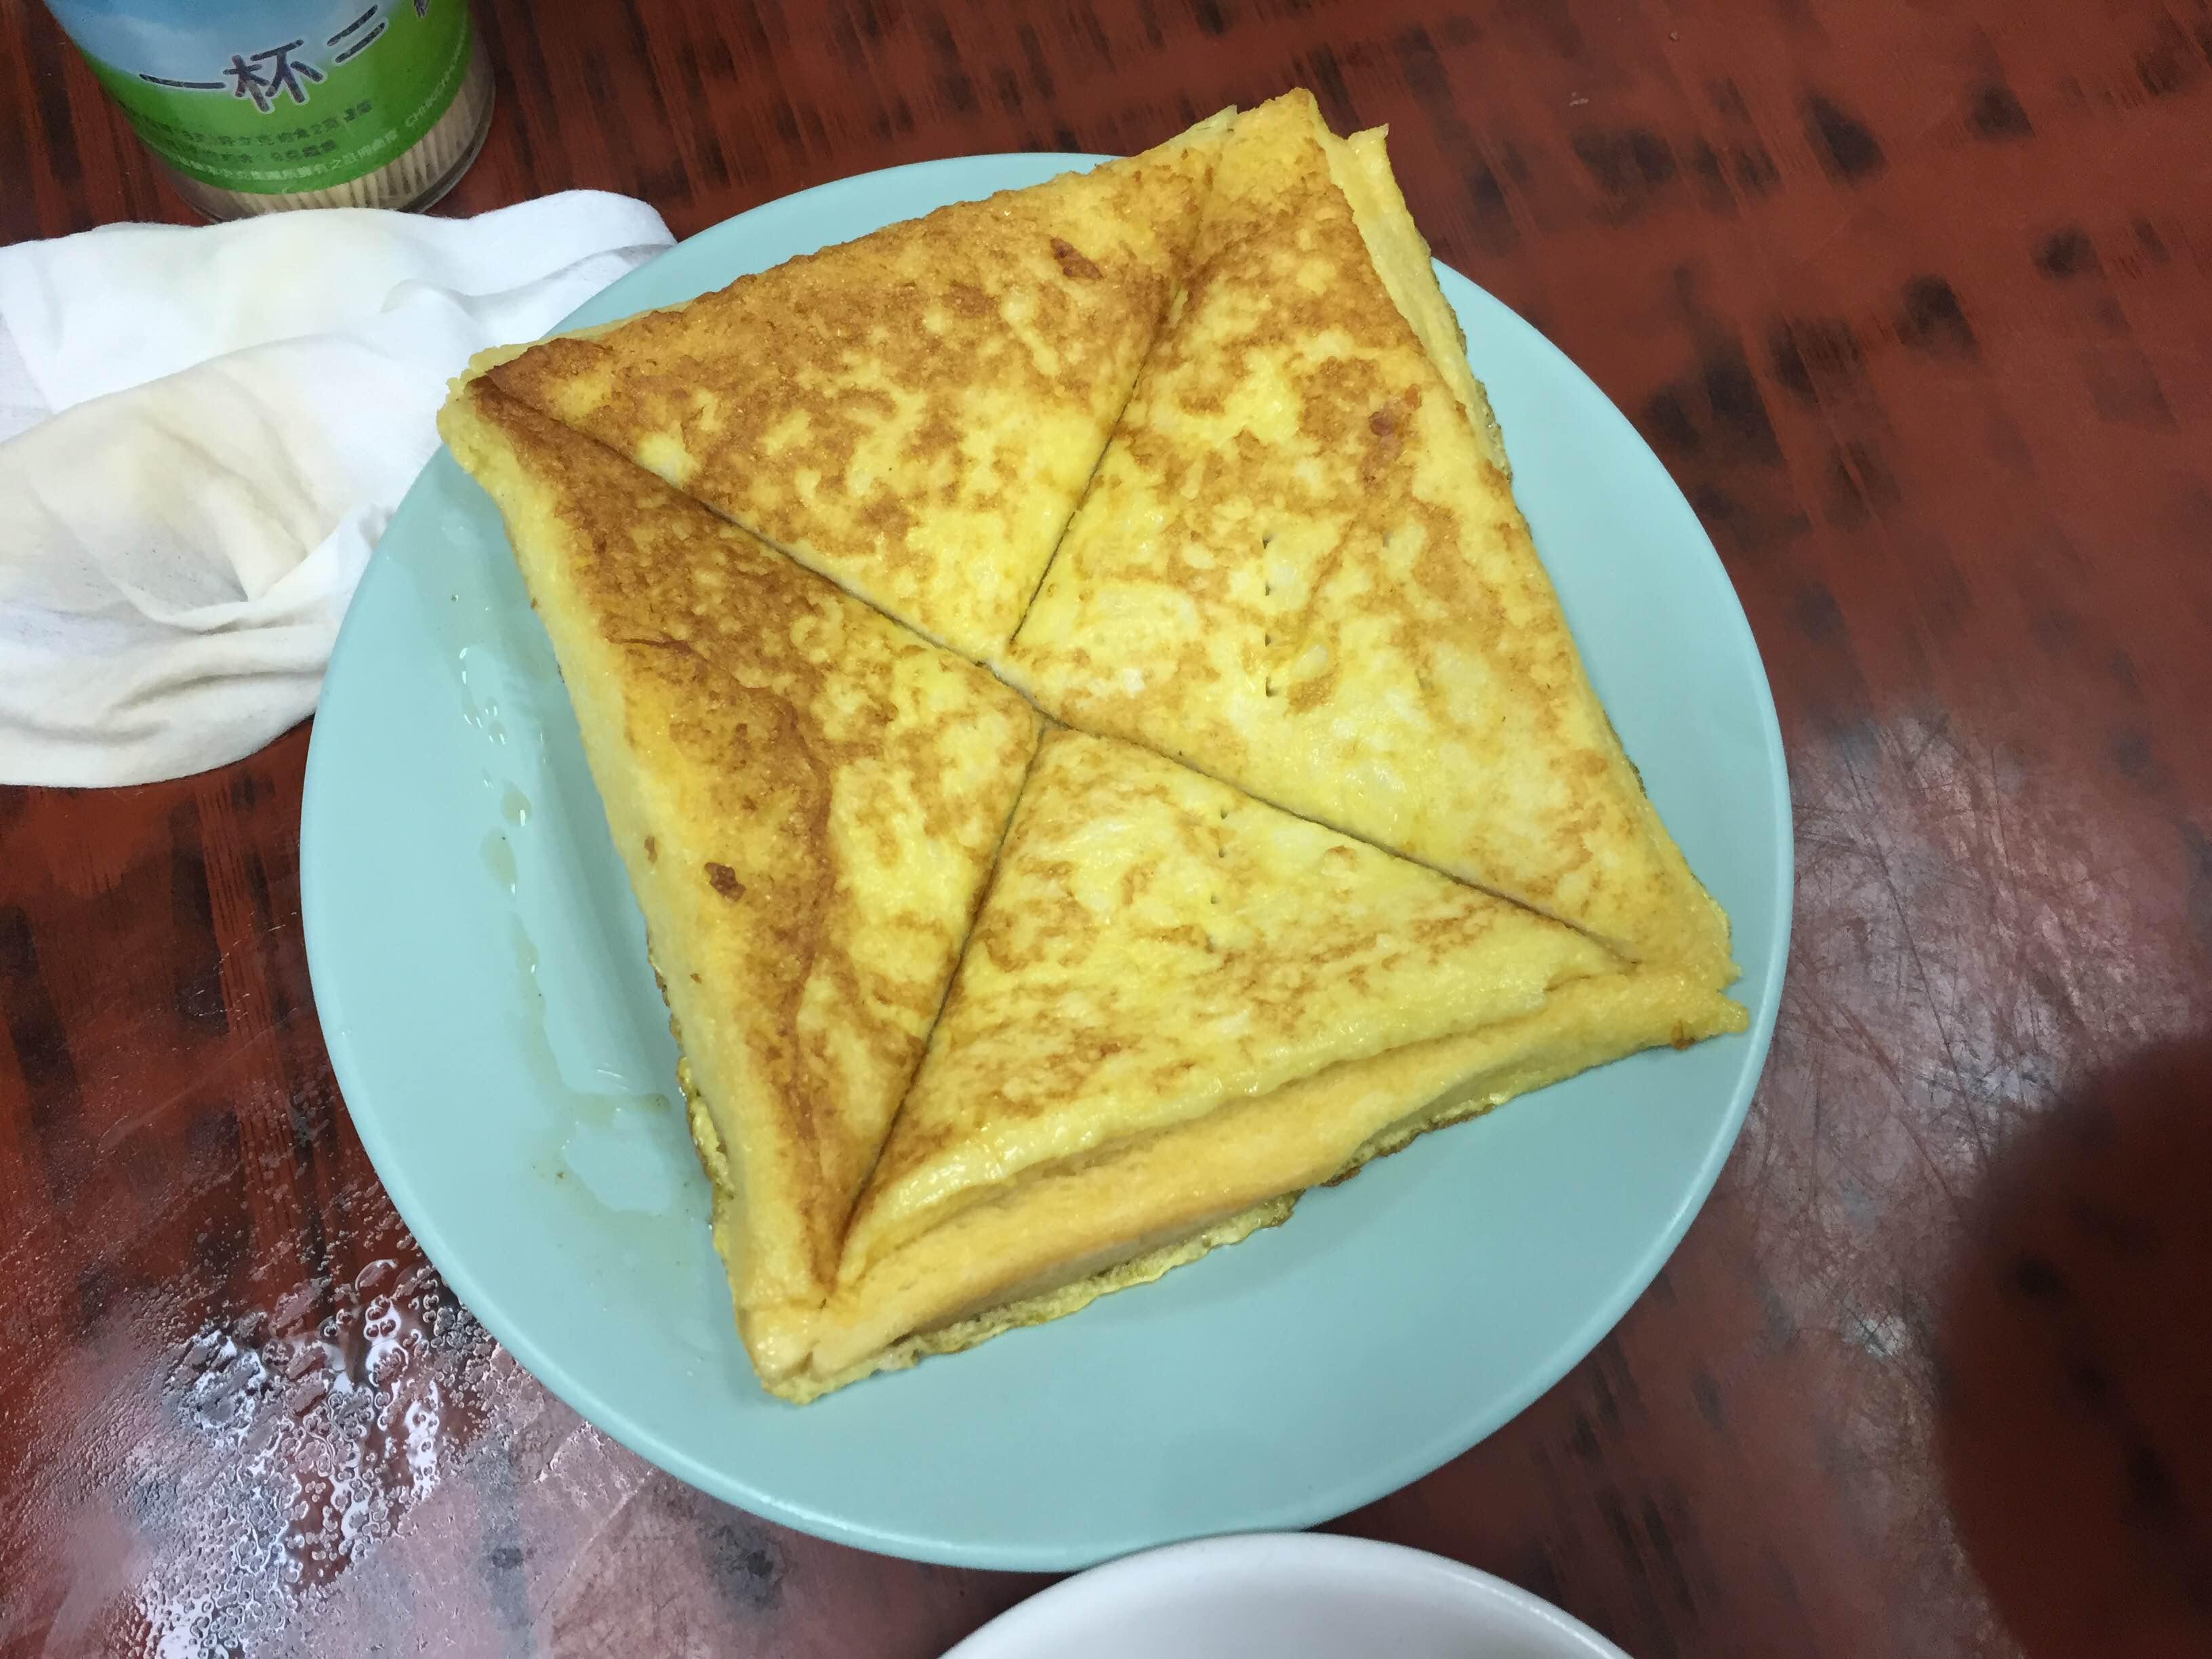 Wai kee Noodle cafe french toast